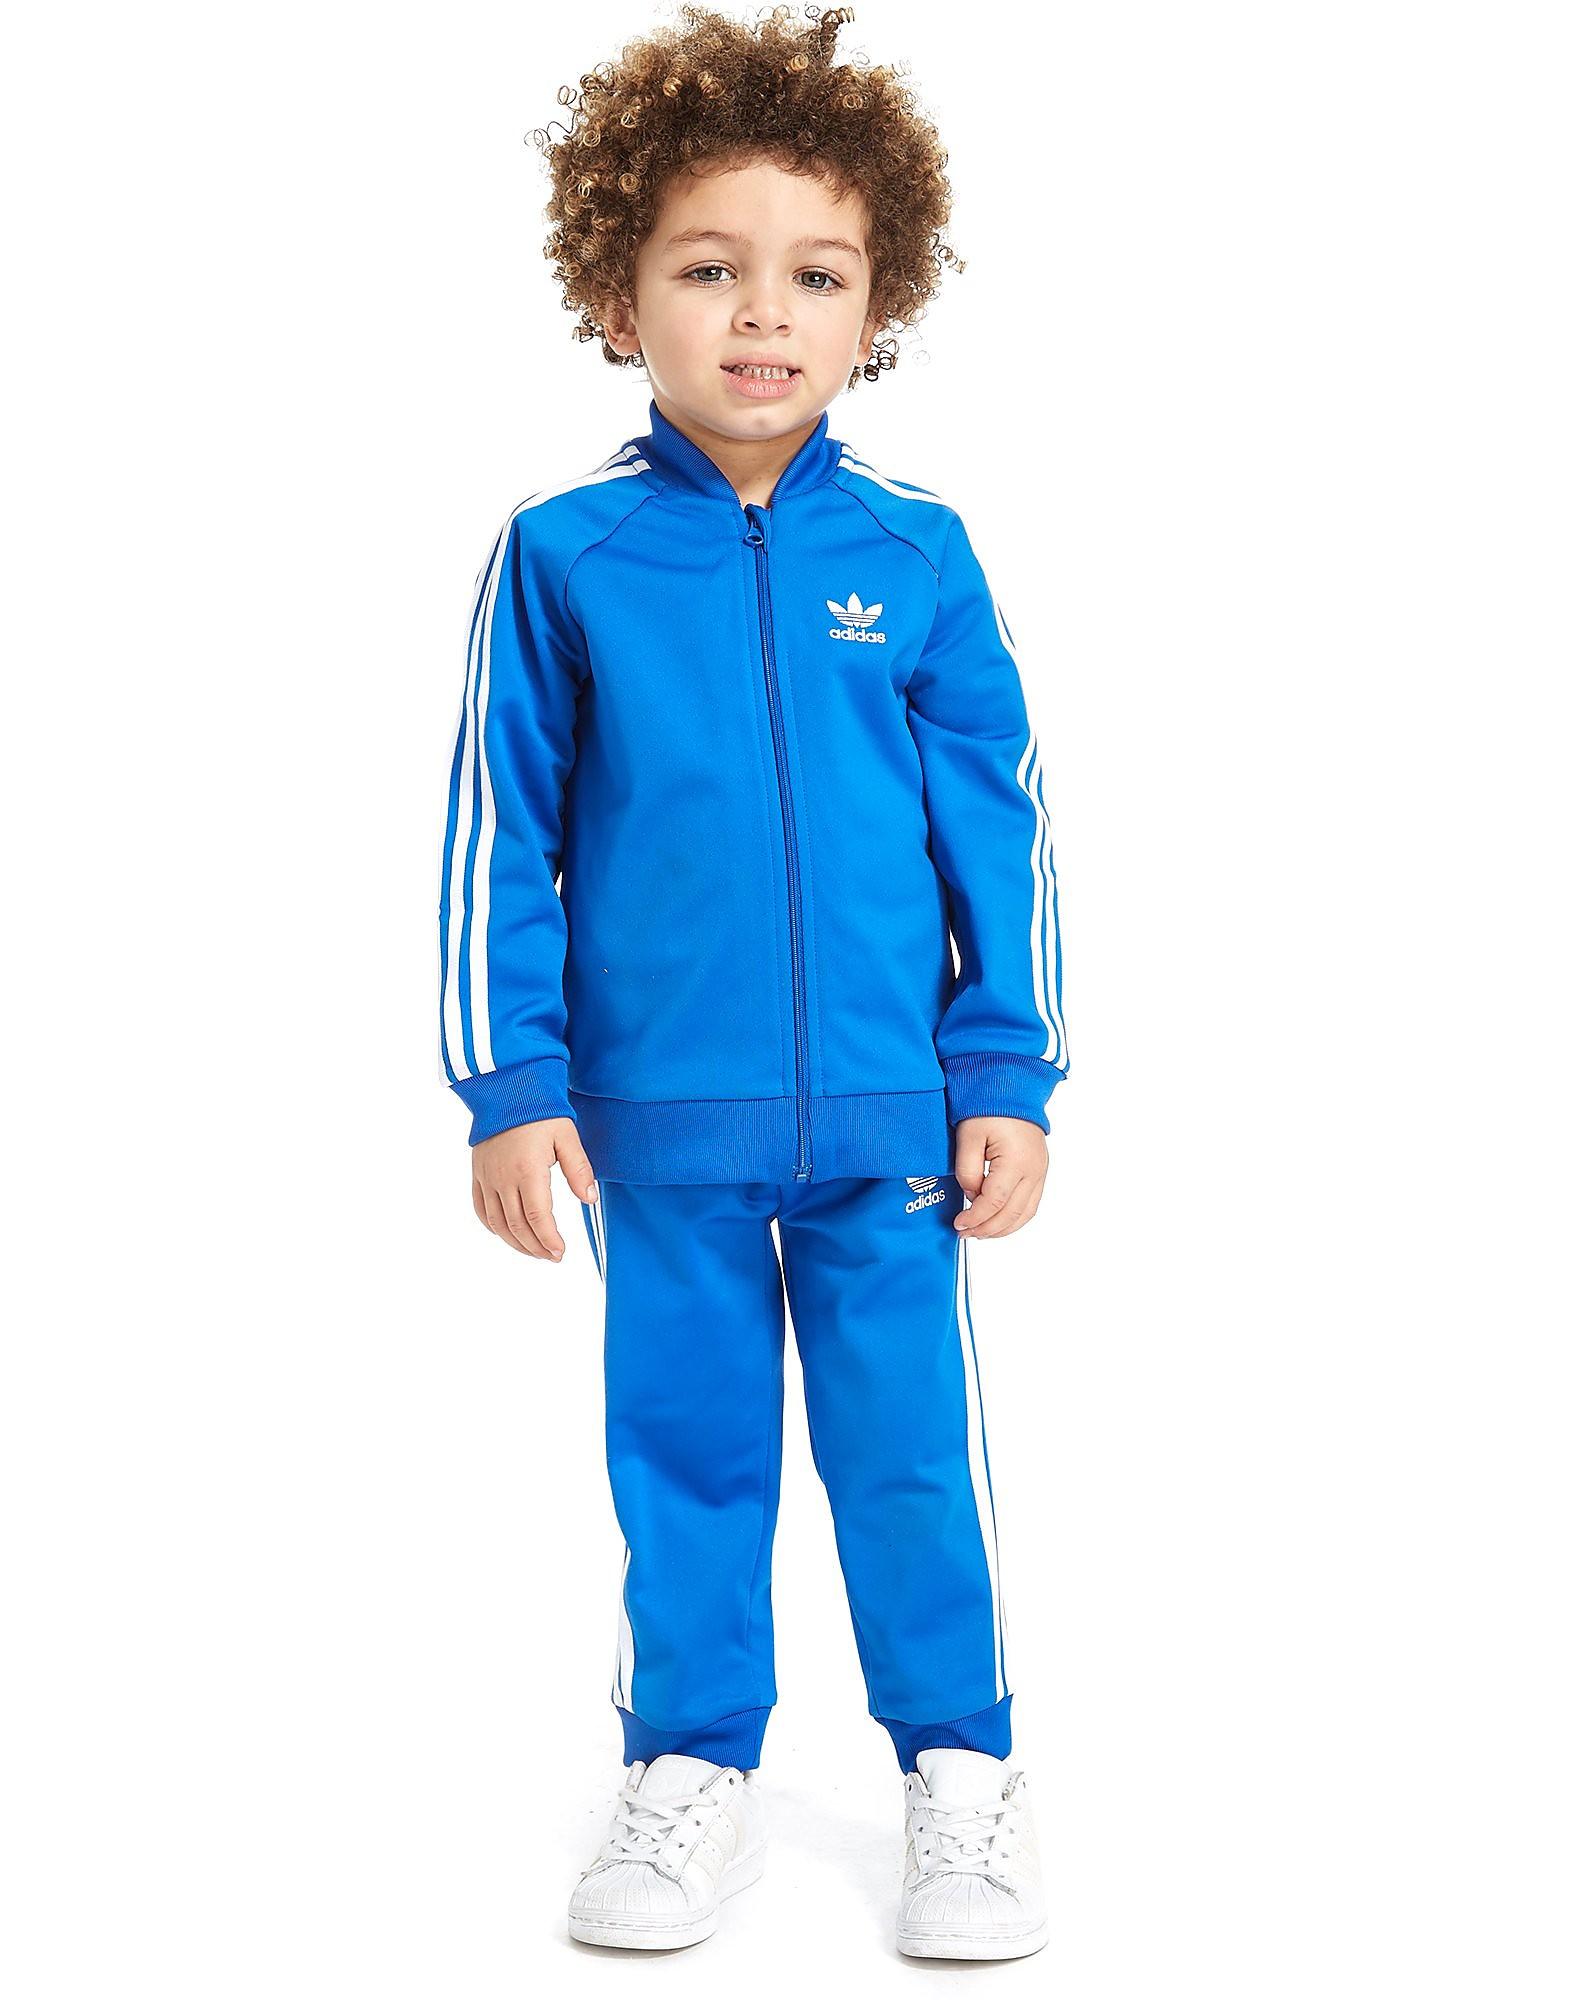 adidas Originals Superstar Trainingsanzug Kleinkind